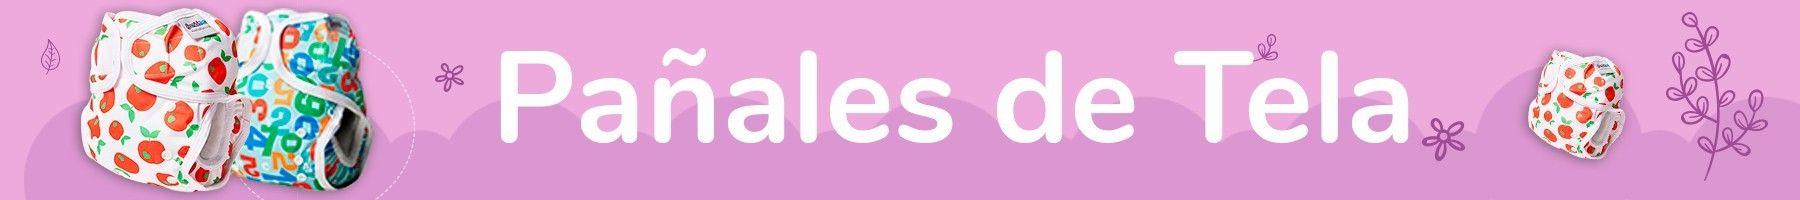 Comprar Pañales de Tela ecológicos para bebés |My Baby's Life